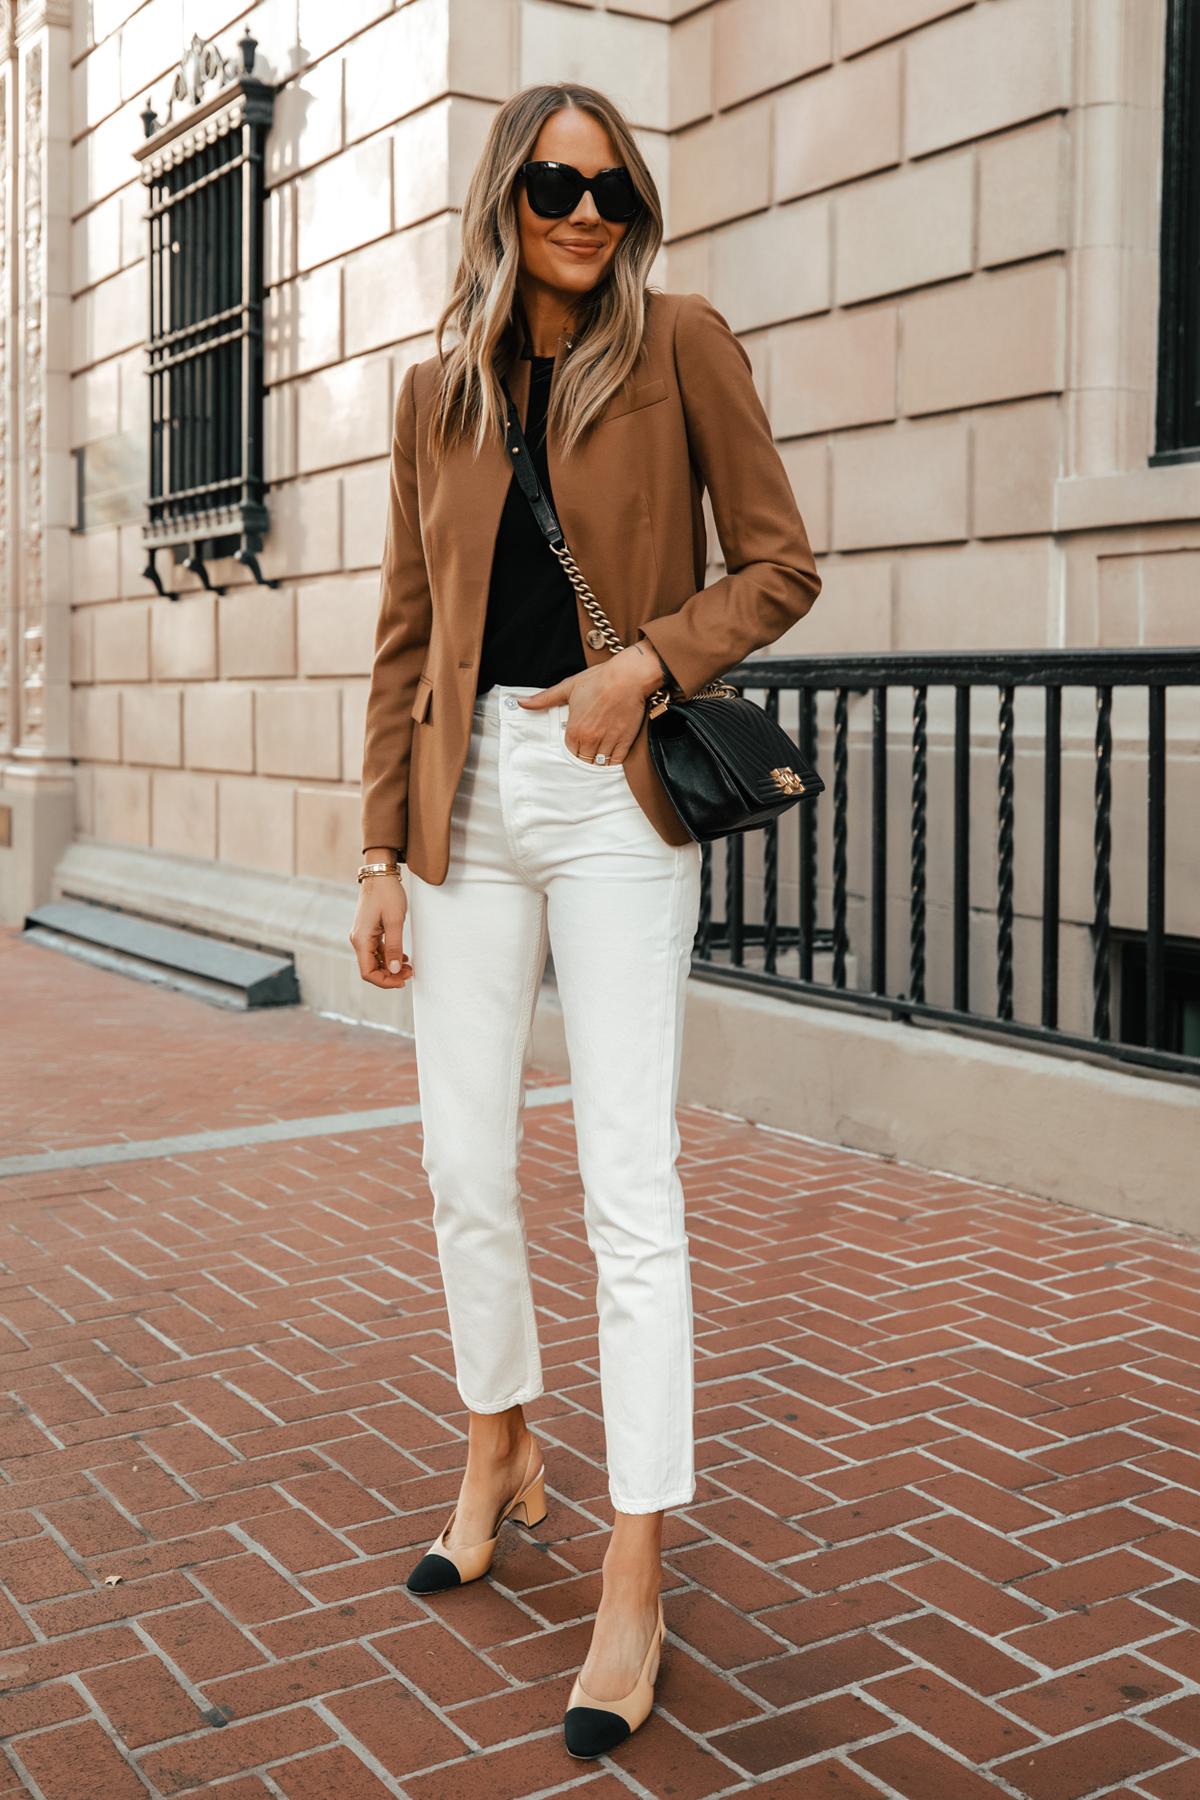 Fashion Jackson Wearing Jcrew Camel Blazer Citizens of Humanity White Jeans Chanel Slingbacks Chanel Black Boy Bag